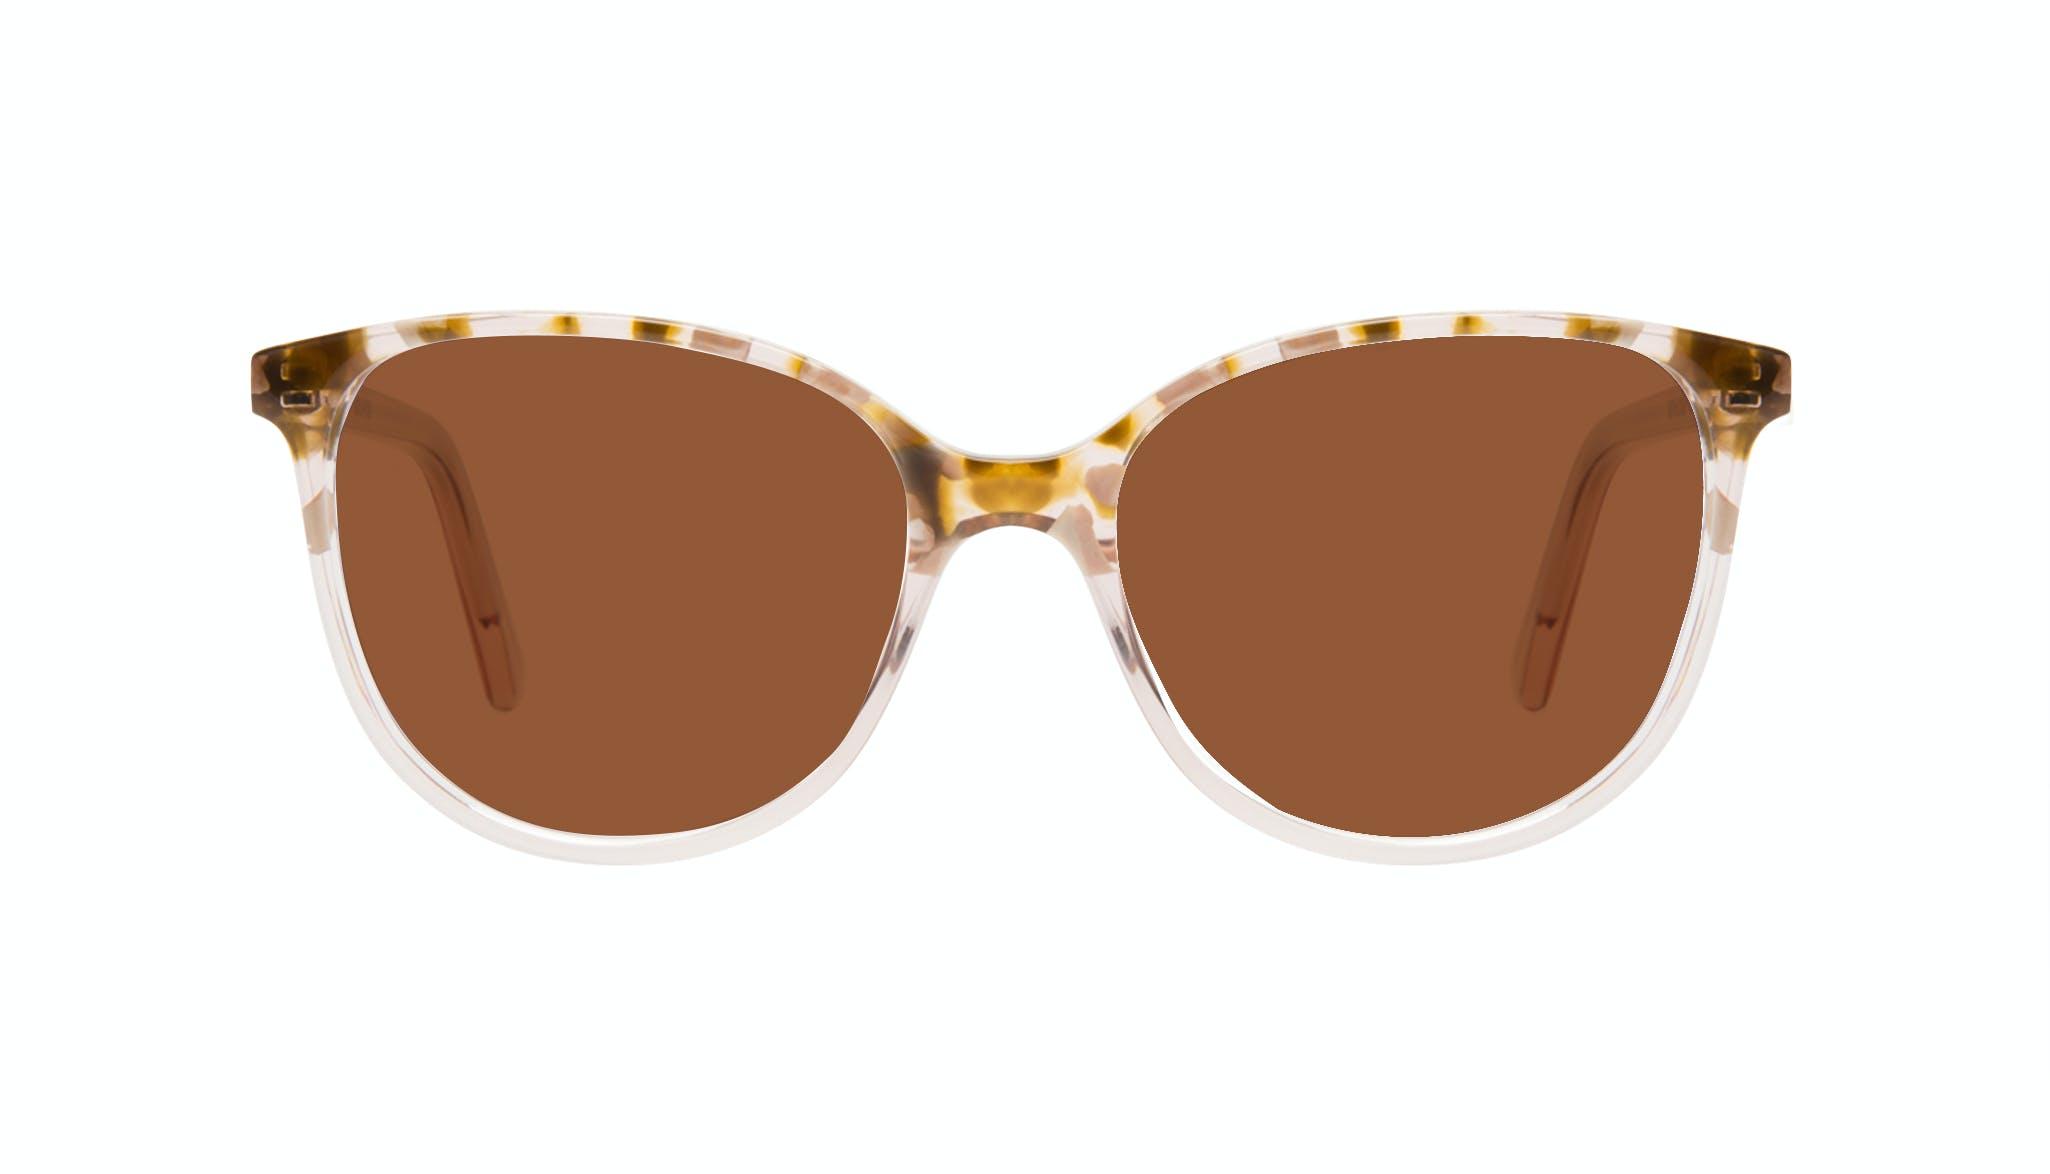 Affordable Fashion Glasses Round Sunglasses Women Imagine Petite Rose Flake